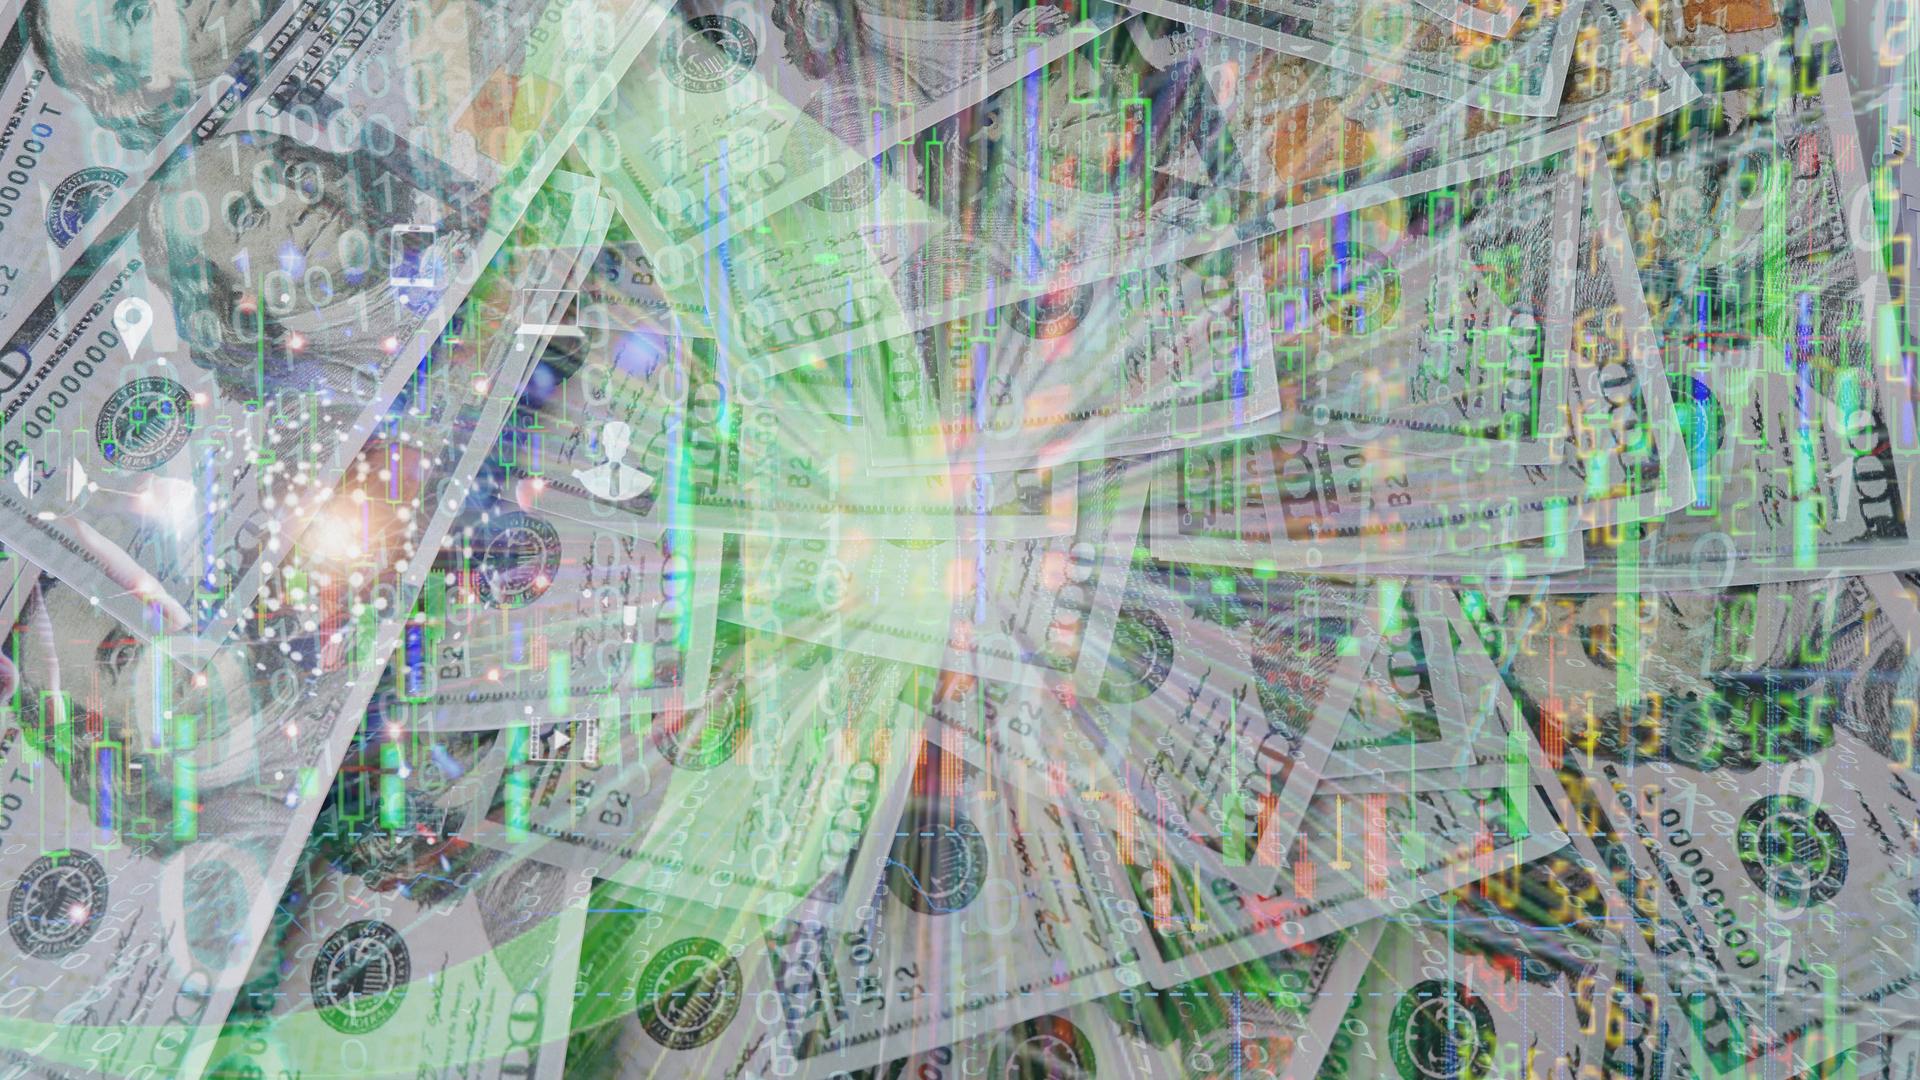 Mega funds disrupting venture capital ecosystem, Neuberger Berman says